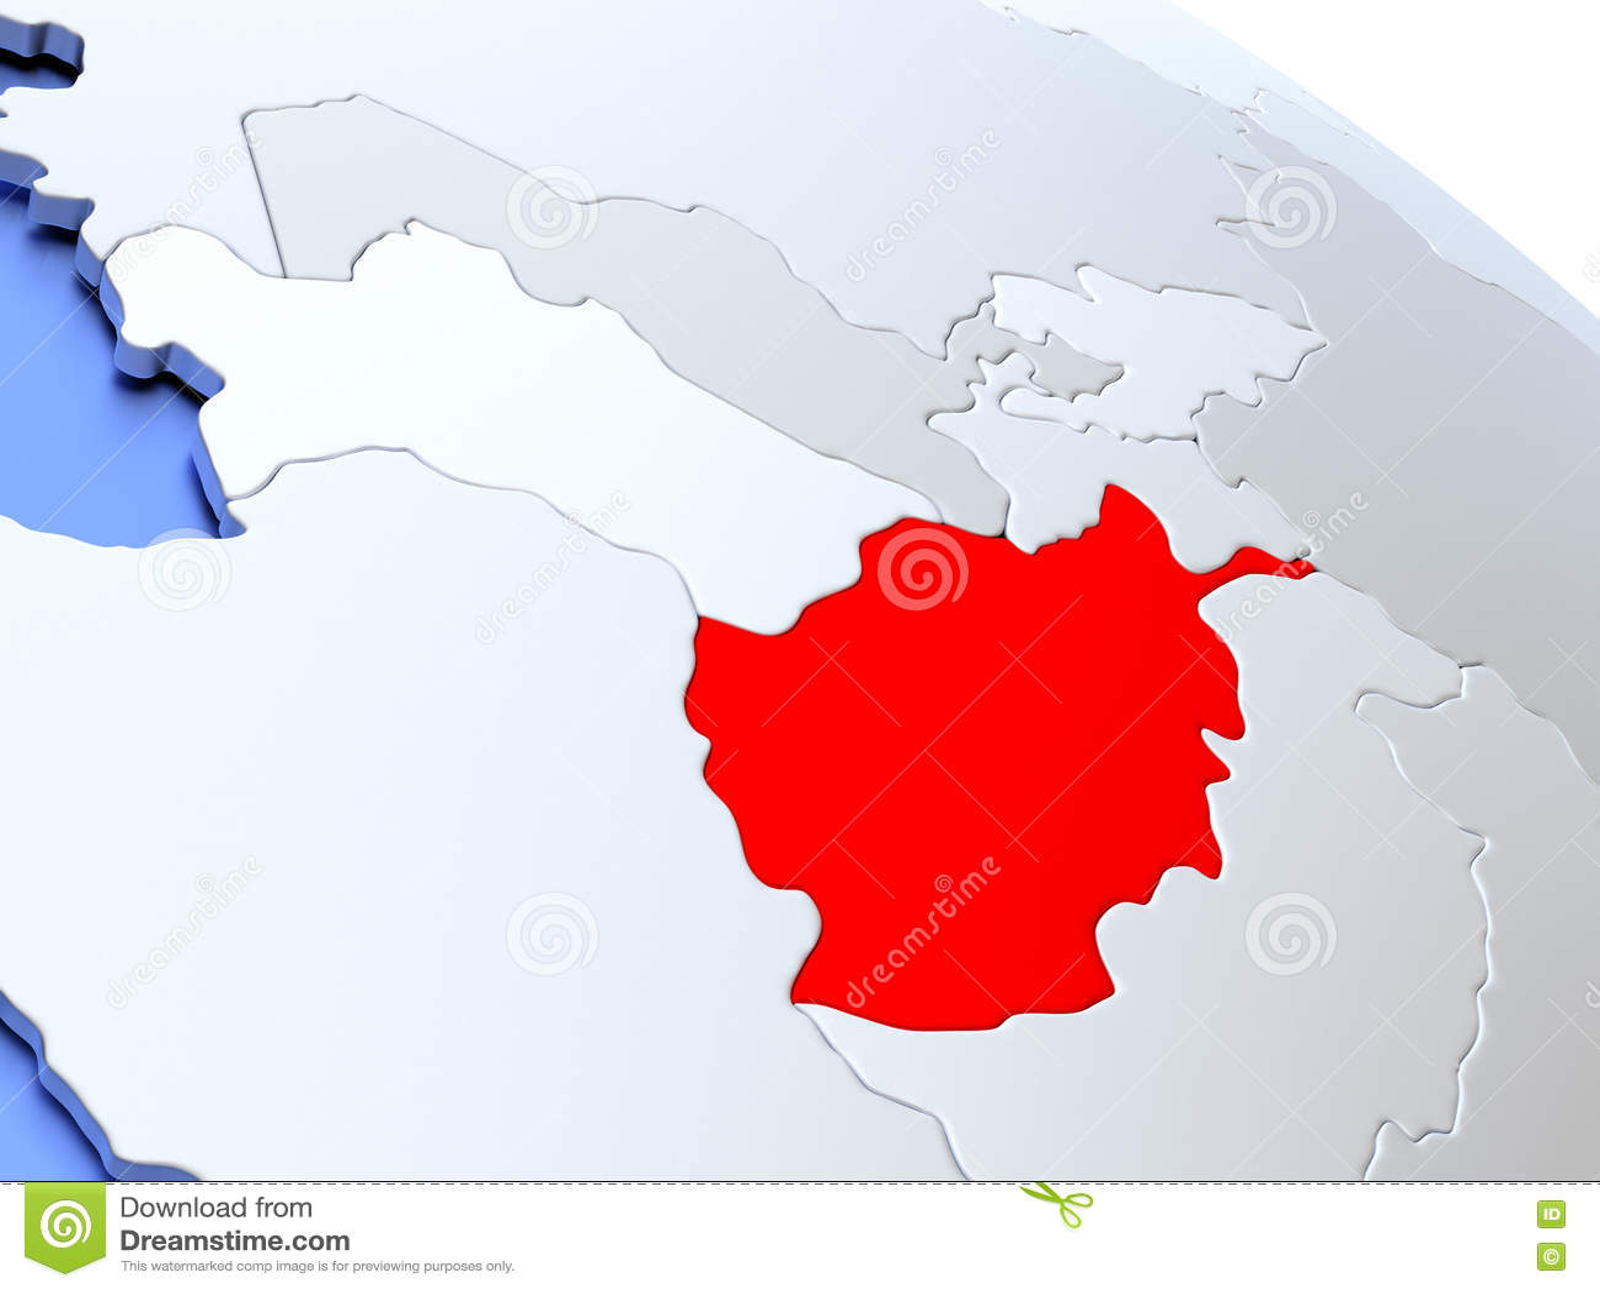 Afghanistan on world map stock illustration. Illustration of render on pyongyang on world map, kolkata world map, sydney world map, algiers world map, new delhi world map, jakarta world map, khartoum world map, novosibirsk world map, kathmandu world map, yerevan world map, buenos aires world map, cairo world map, damascus world map, herat world map, riyadh world map, baku on world map, samarkand world map, lima world map, tehran world map, rabat world map,